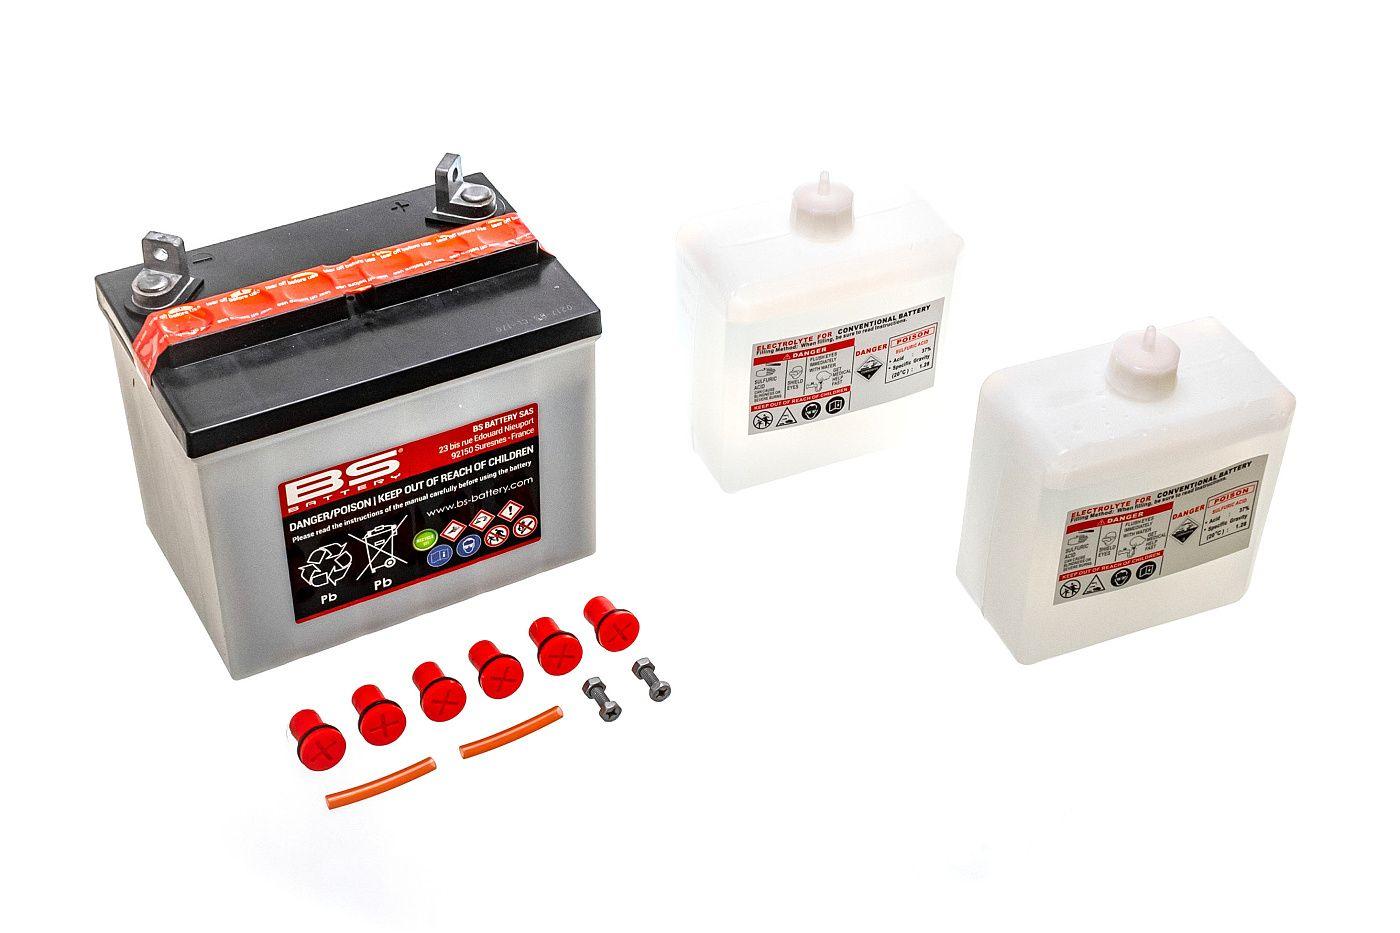 Akumulátor s kyselým elektrolytem 12V 24Ah LEVÝ PLUS